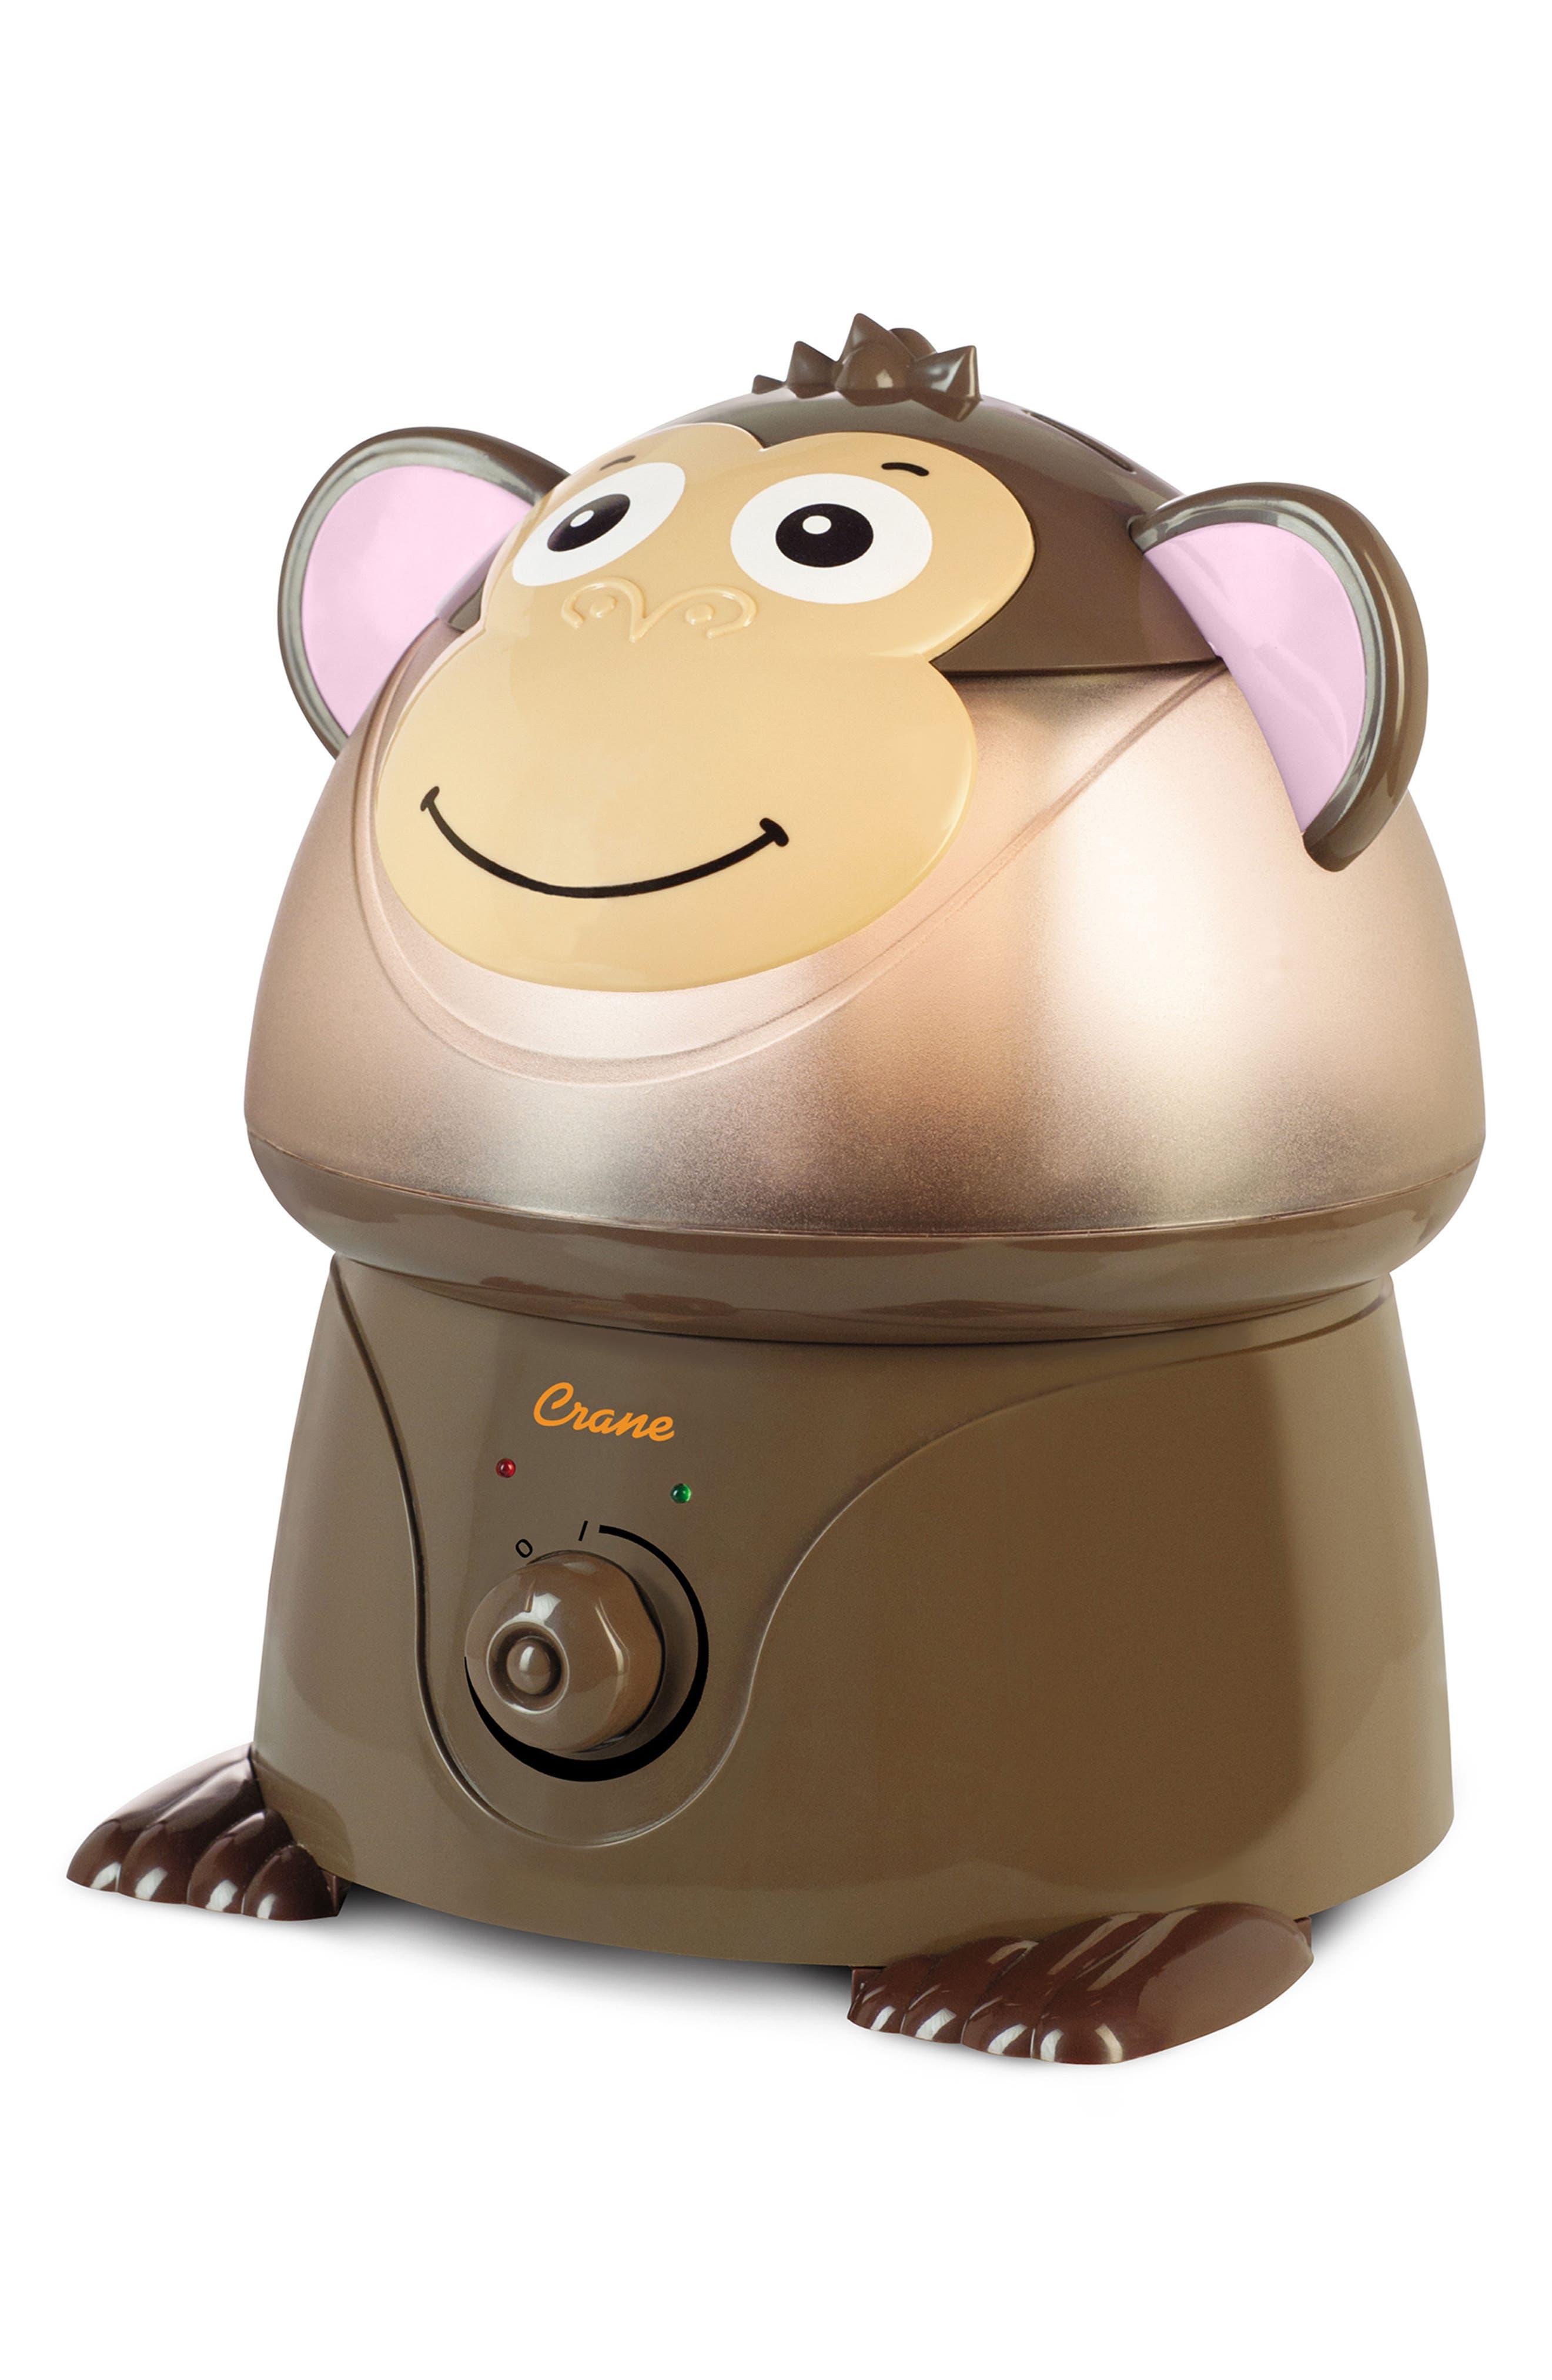 Crane Air Monkey Ultrasonic Cool-Mist Humidifier